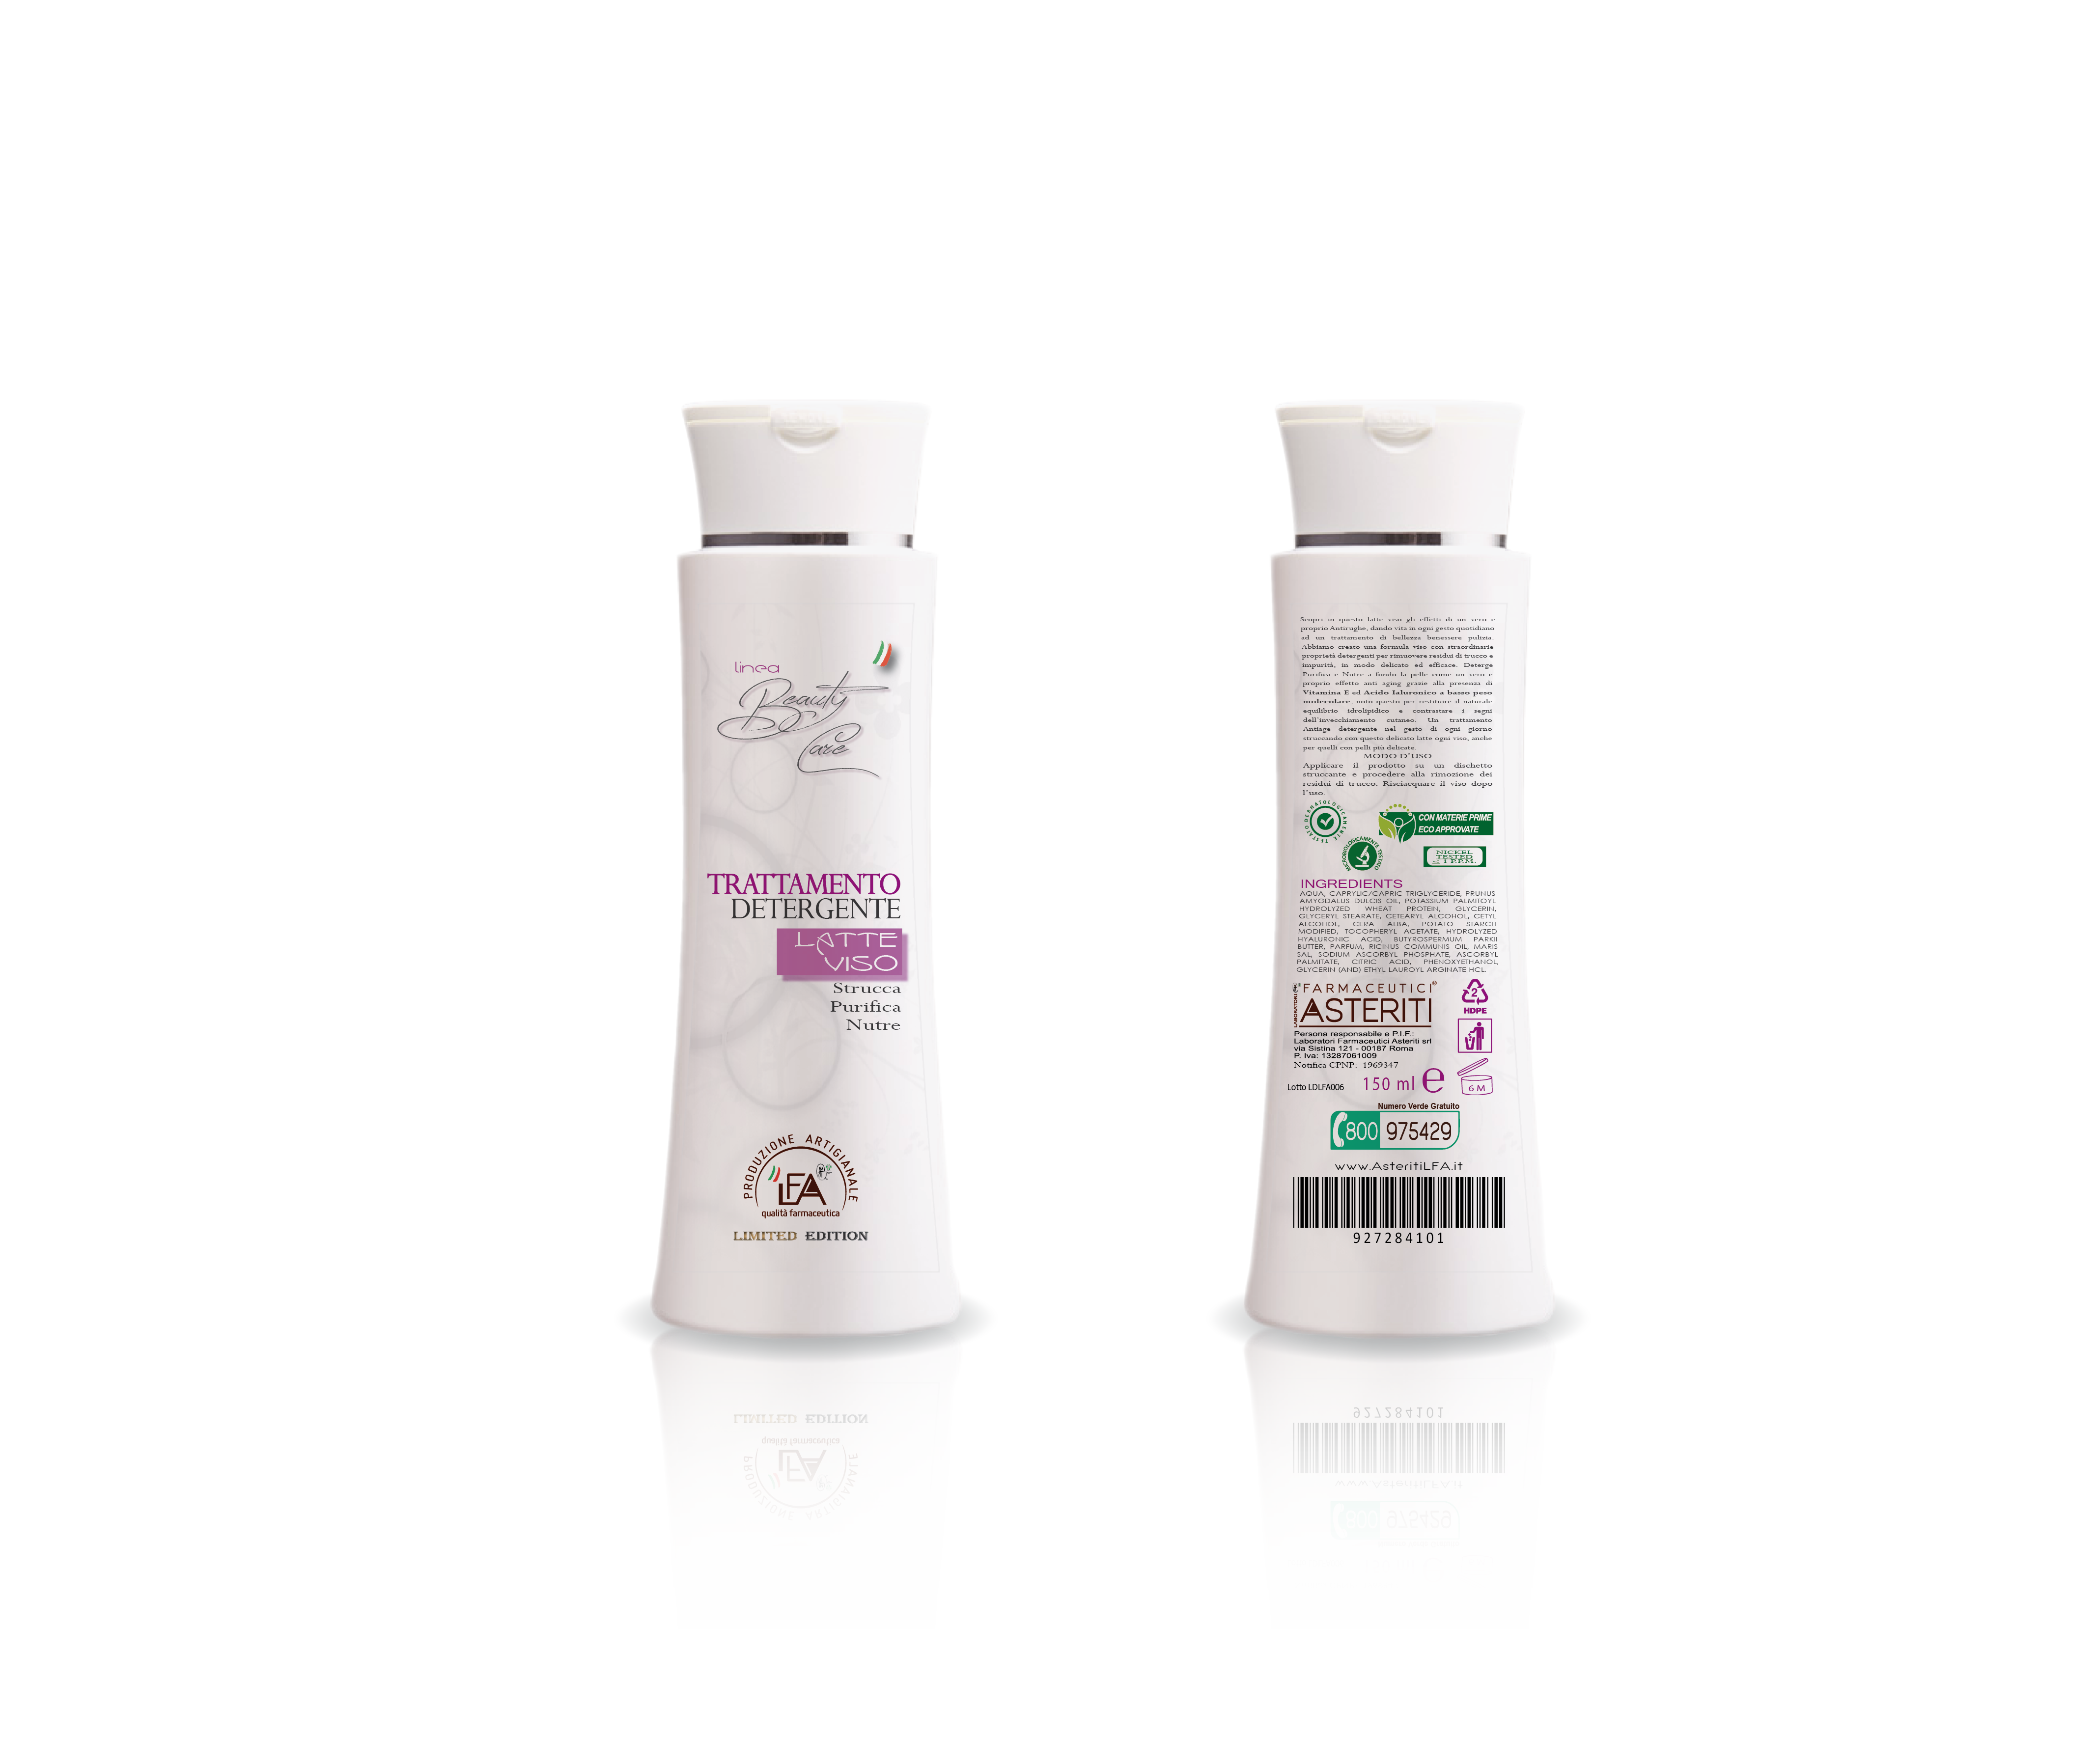 1024x862 Latte Detergente BeautyCare-02